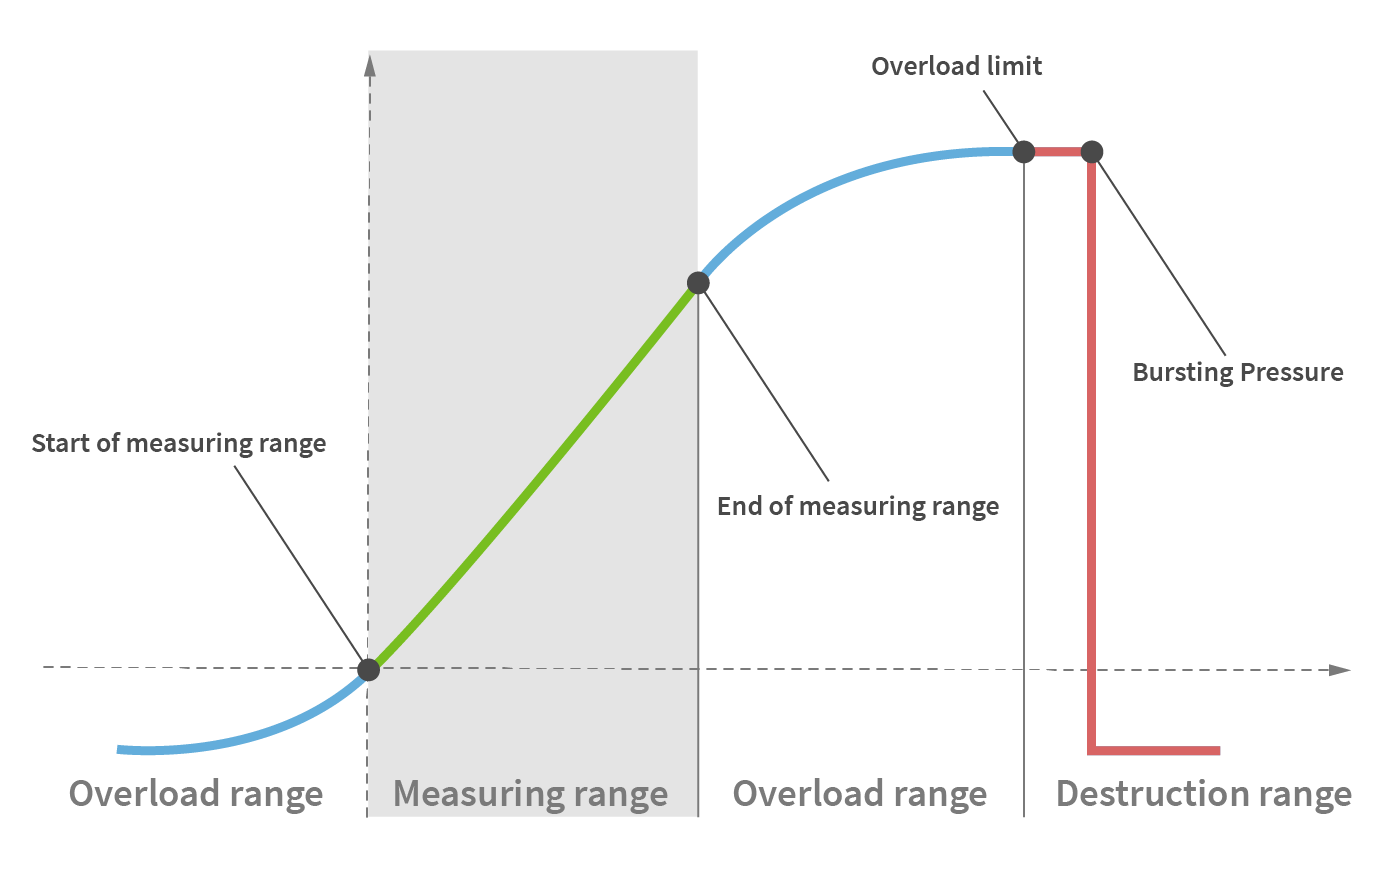 Measuring ranges and rating of pressure sensors